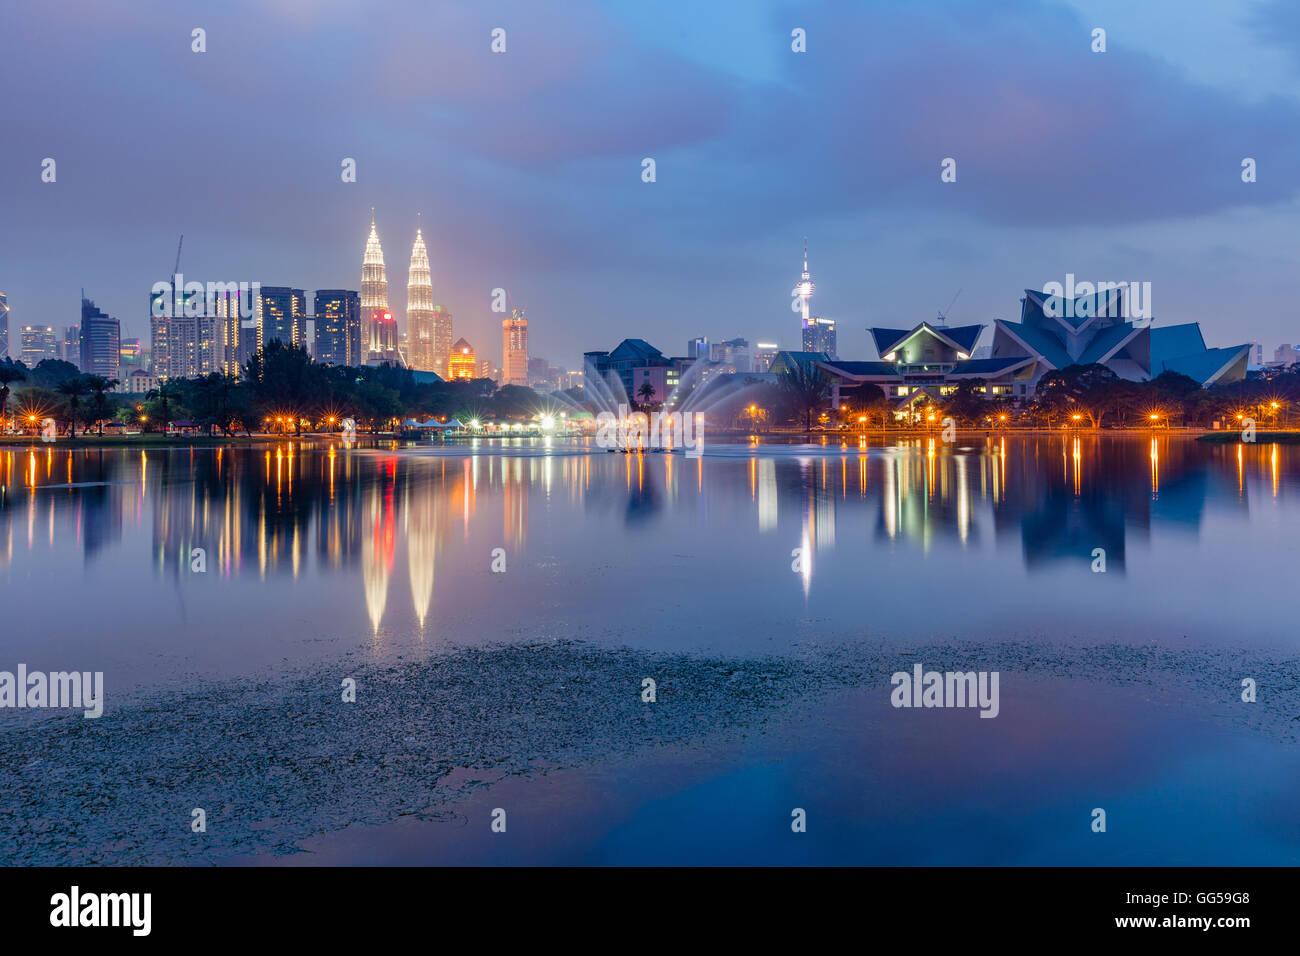 Kuala Lumpur skyline al tramonto visto da Titiwangsa laghi, Kuala Lumpur, Malesia Immagini Stock